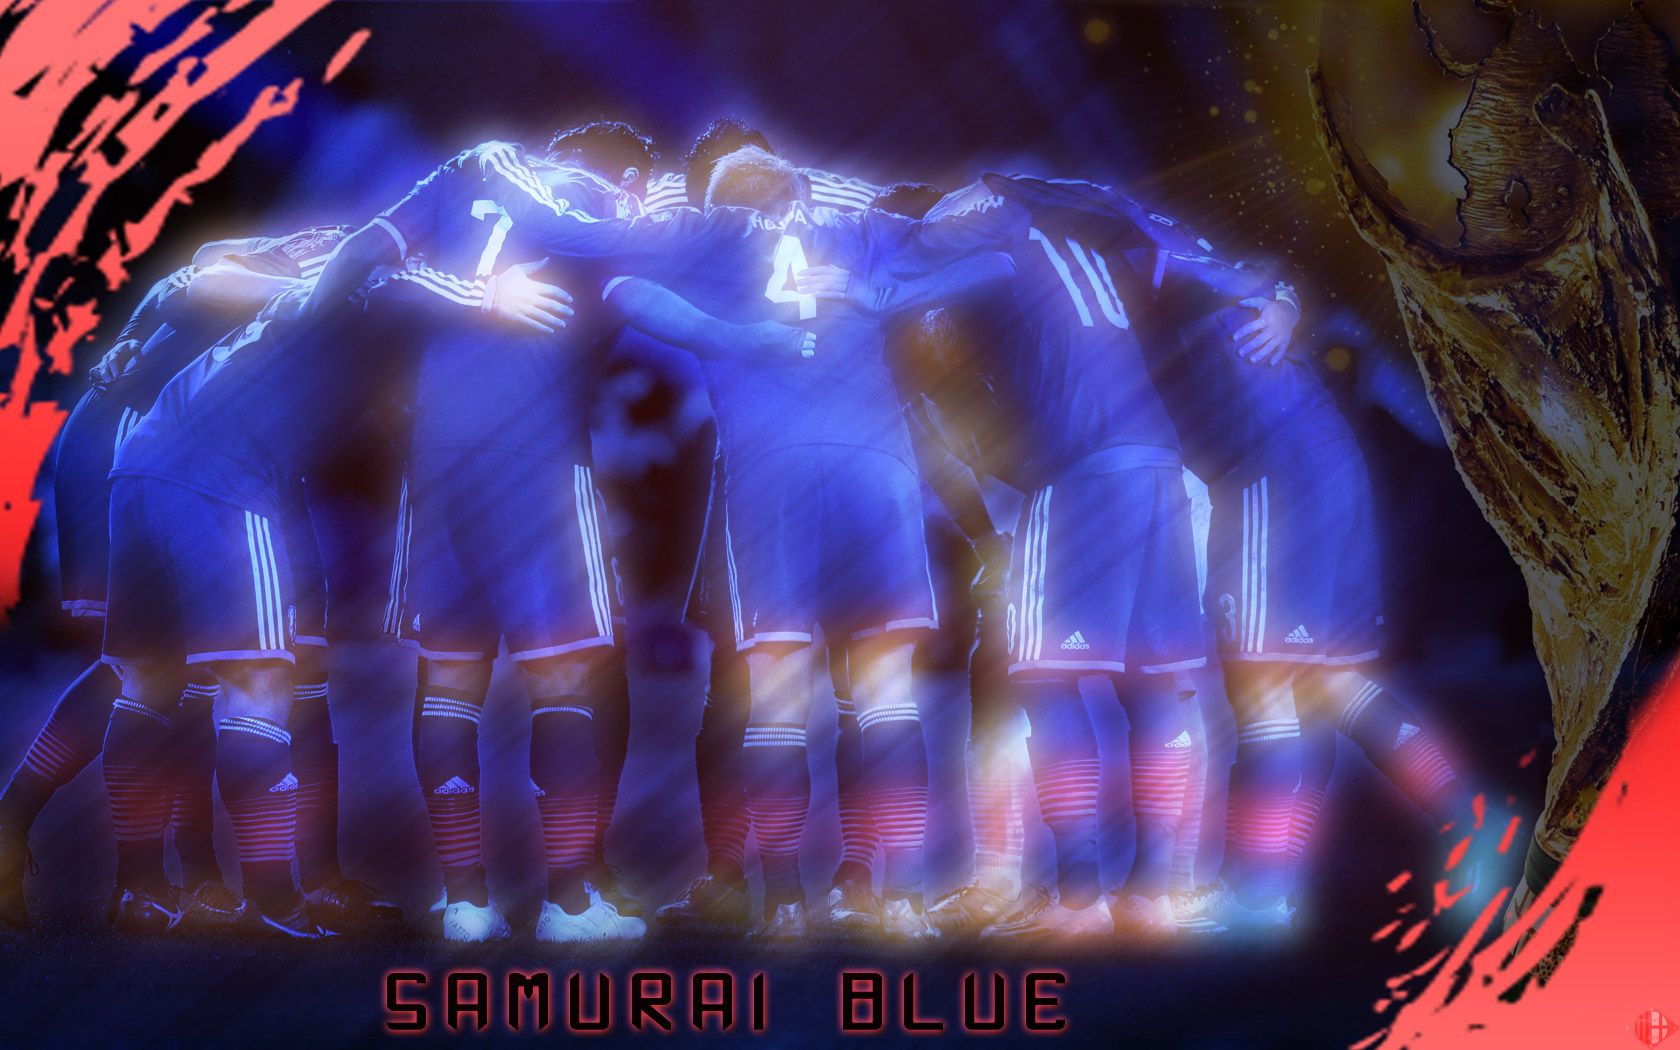 Pc壁紙 Samurai Blue 日本代表 サッカー壁紙 自分で作った